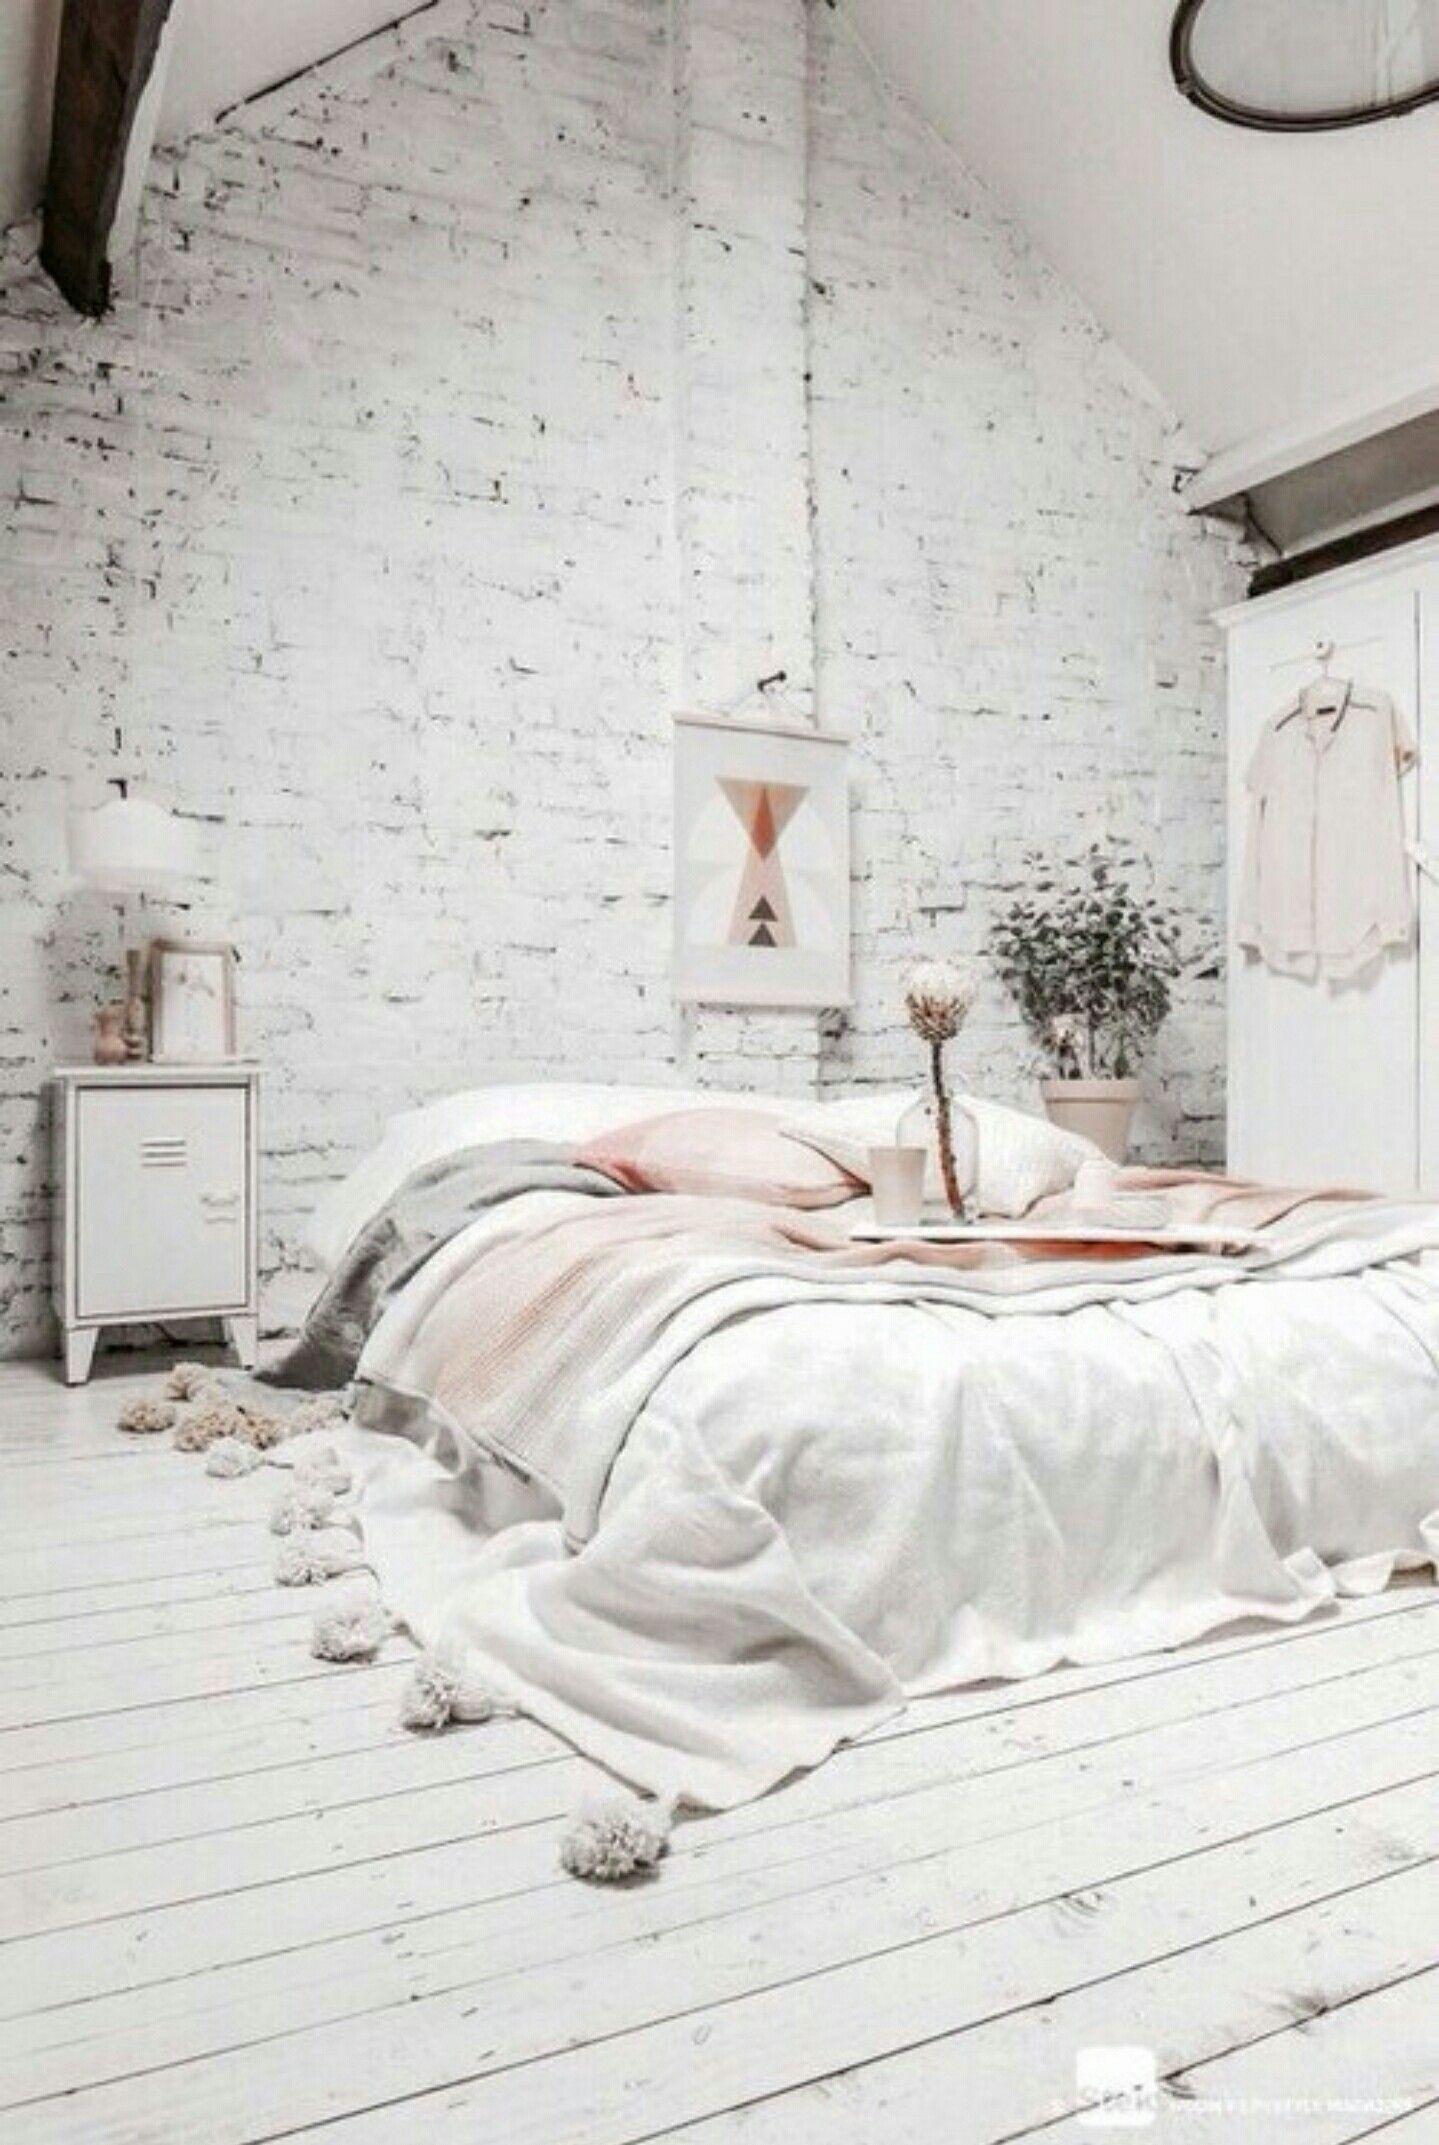 Rose Gold Black White And Grey Bedroom Interior Dream Decor Bedroom Design